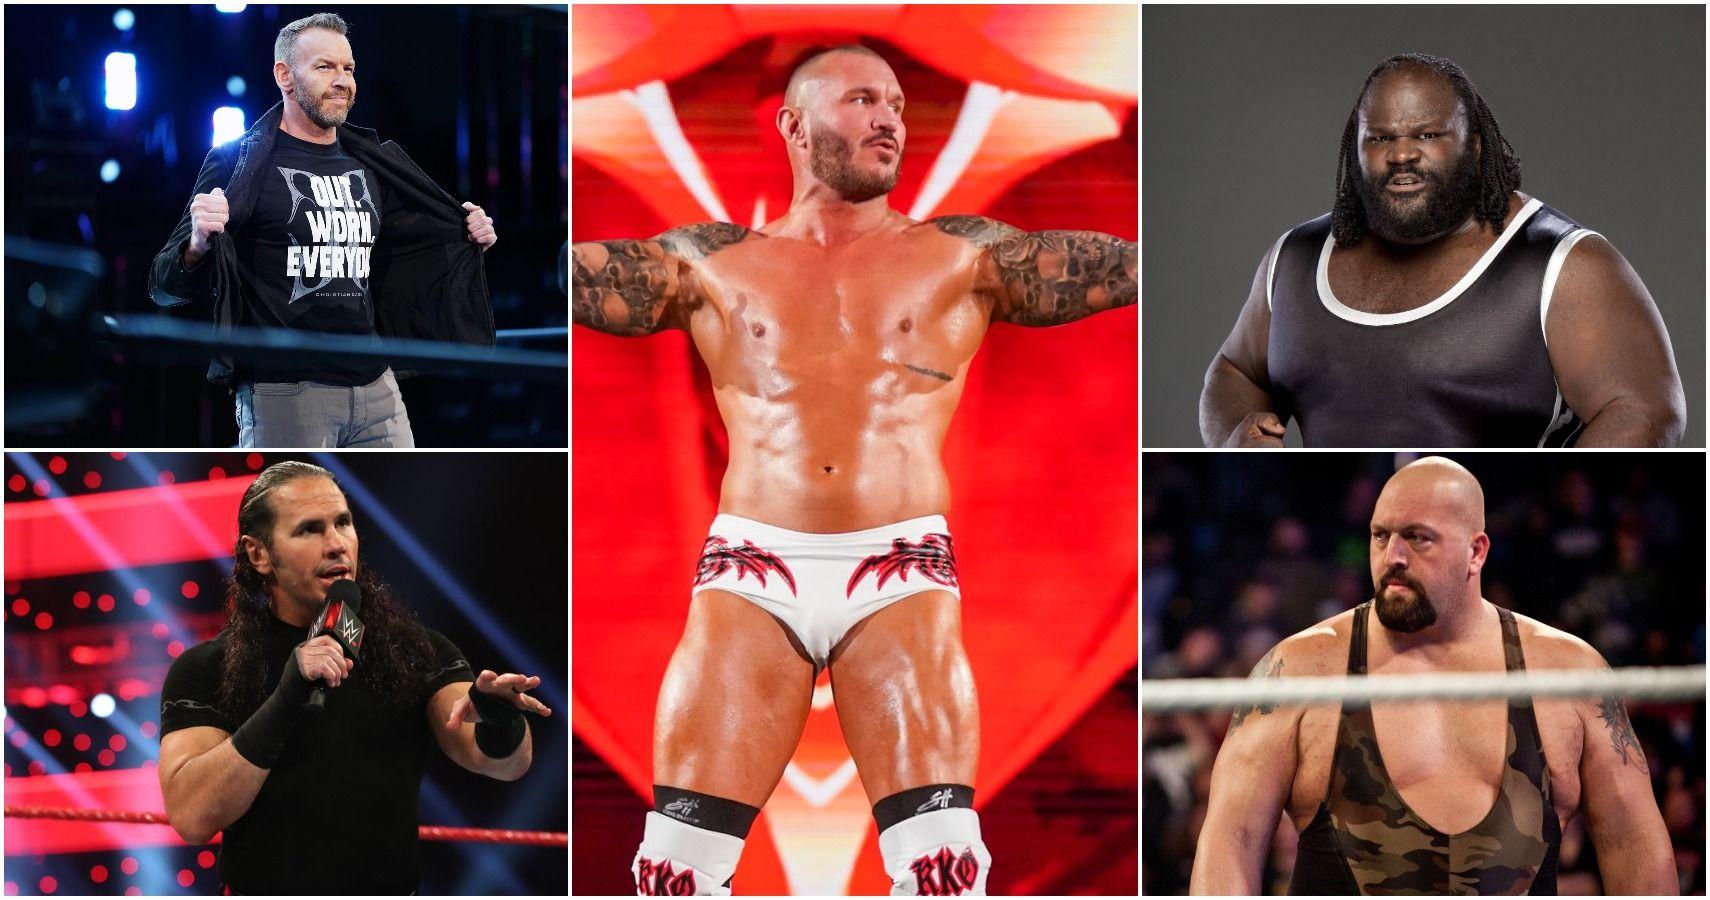 Randy Orton's Run Of Sending WWE Superstars To AEW Continues